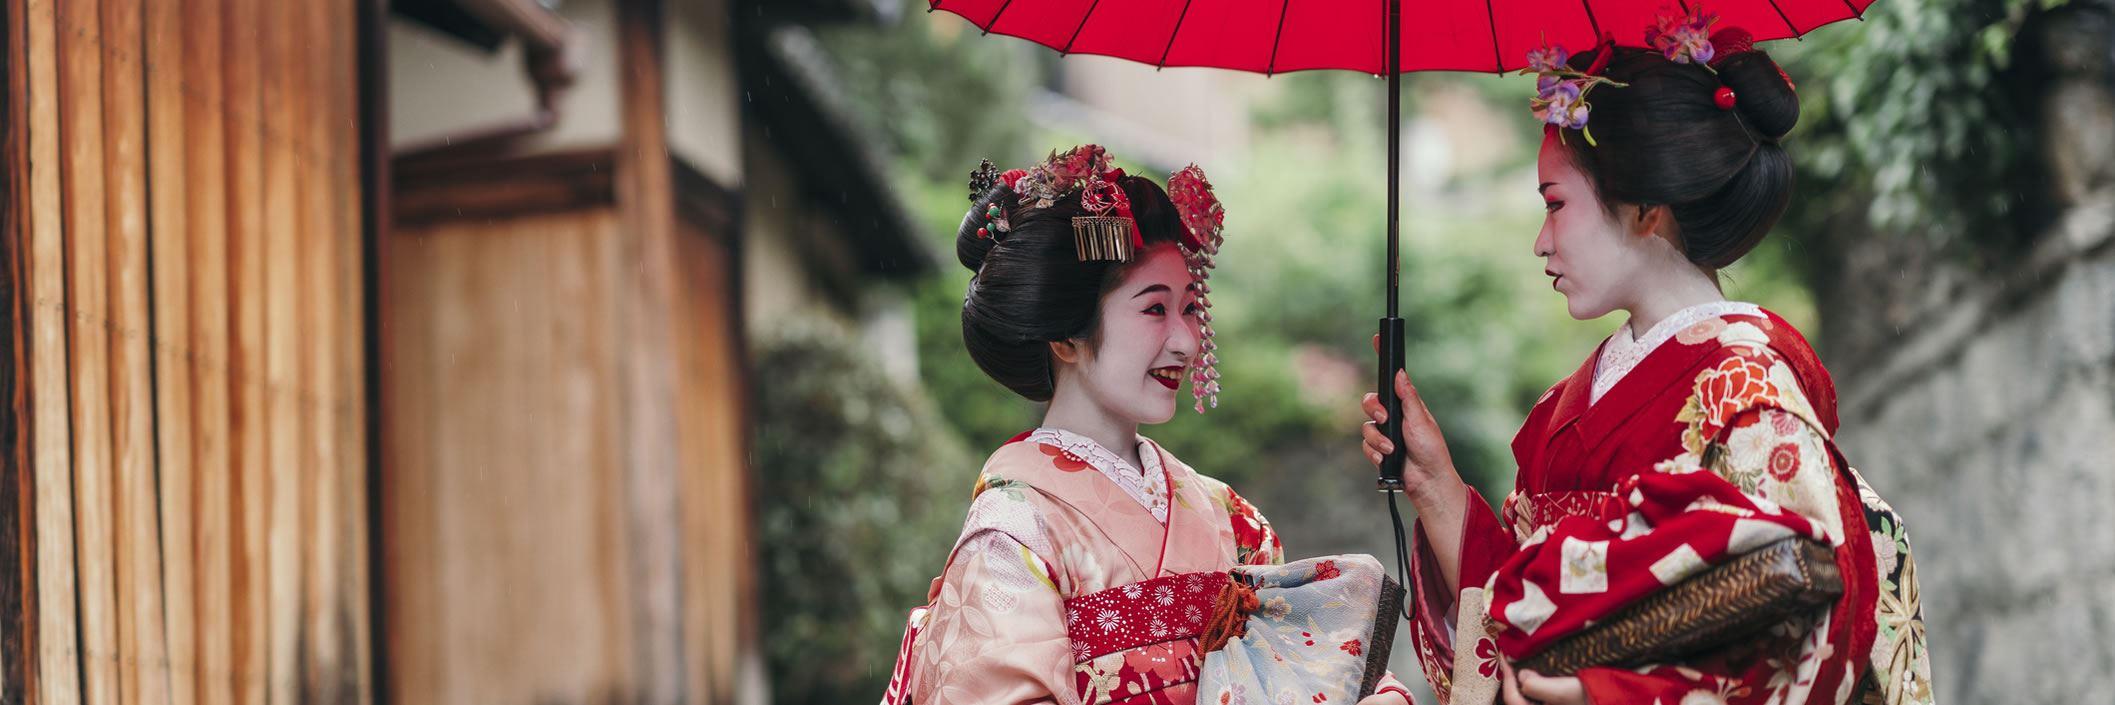 Geishas in Gion, Kyoto